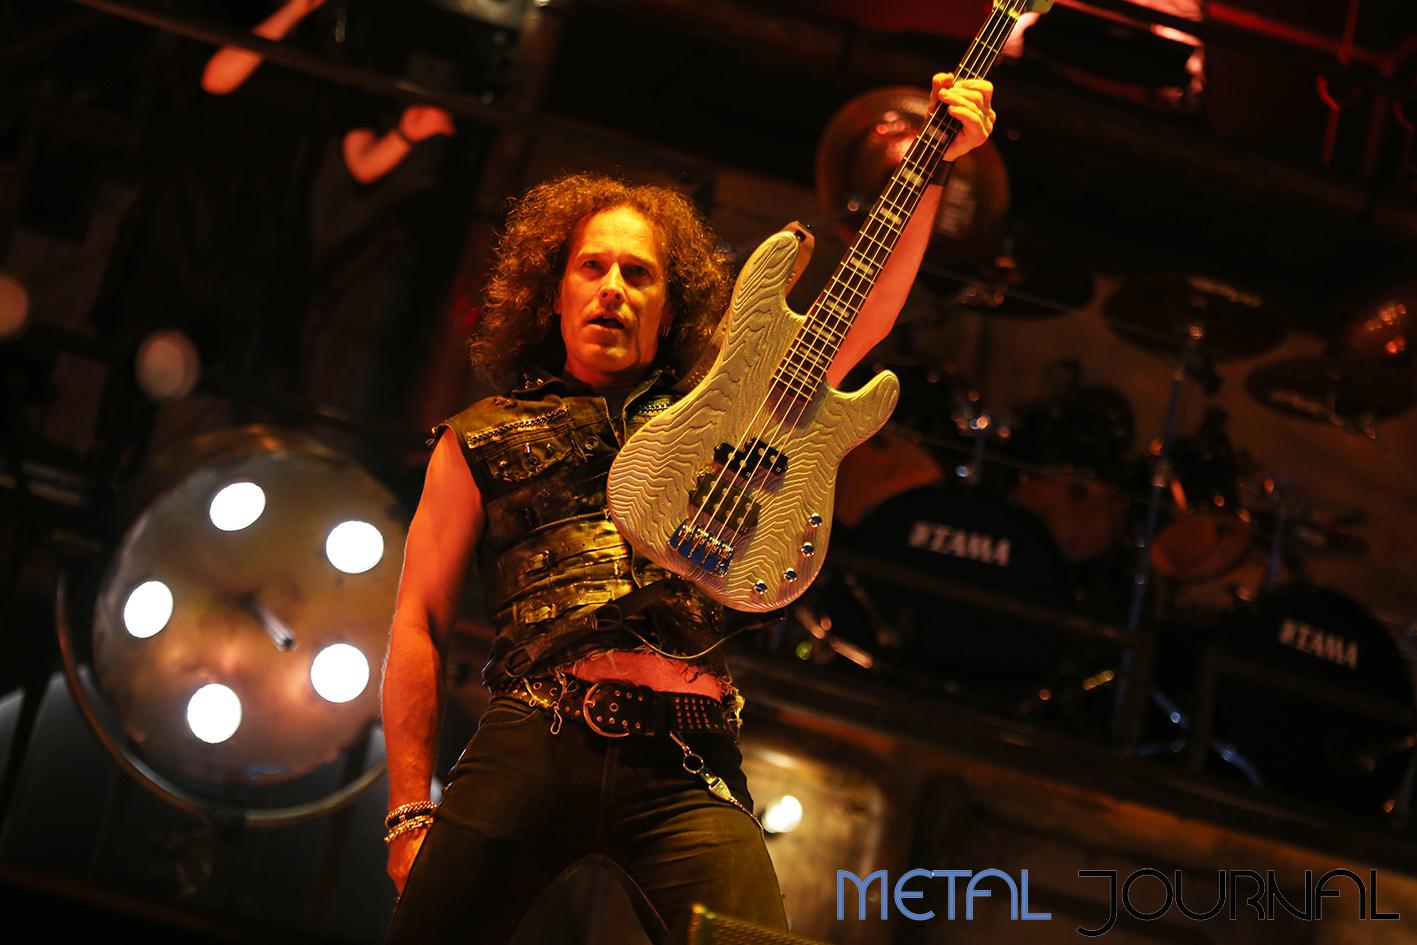 king diamond - metal journal rock fest barcelona 2019 pic 11